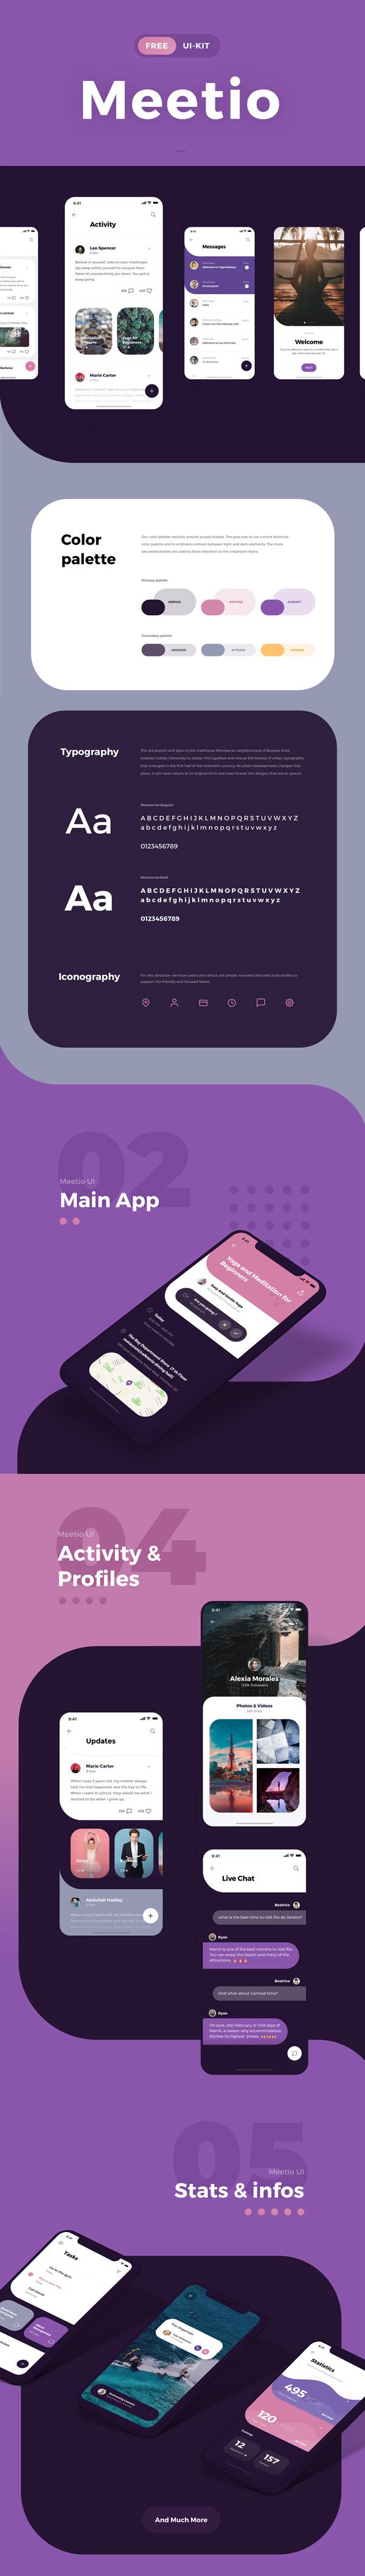 Freebies for 2019: Free Meetio UI-Kit for Adobe XD